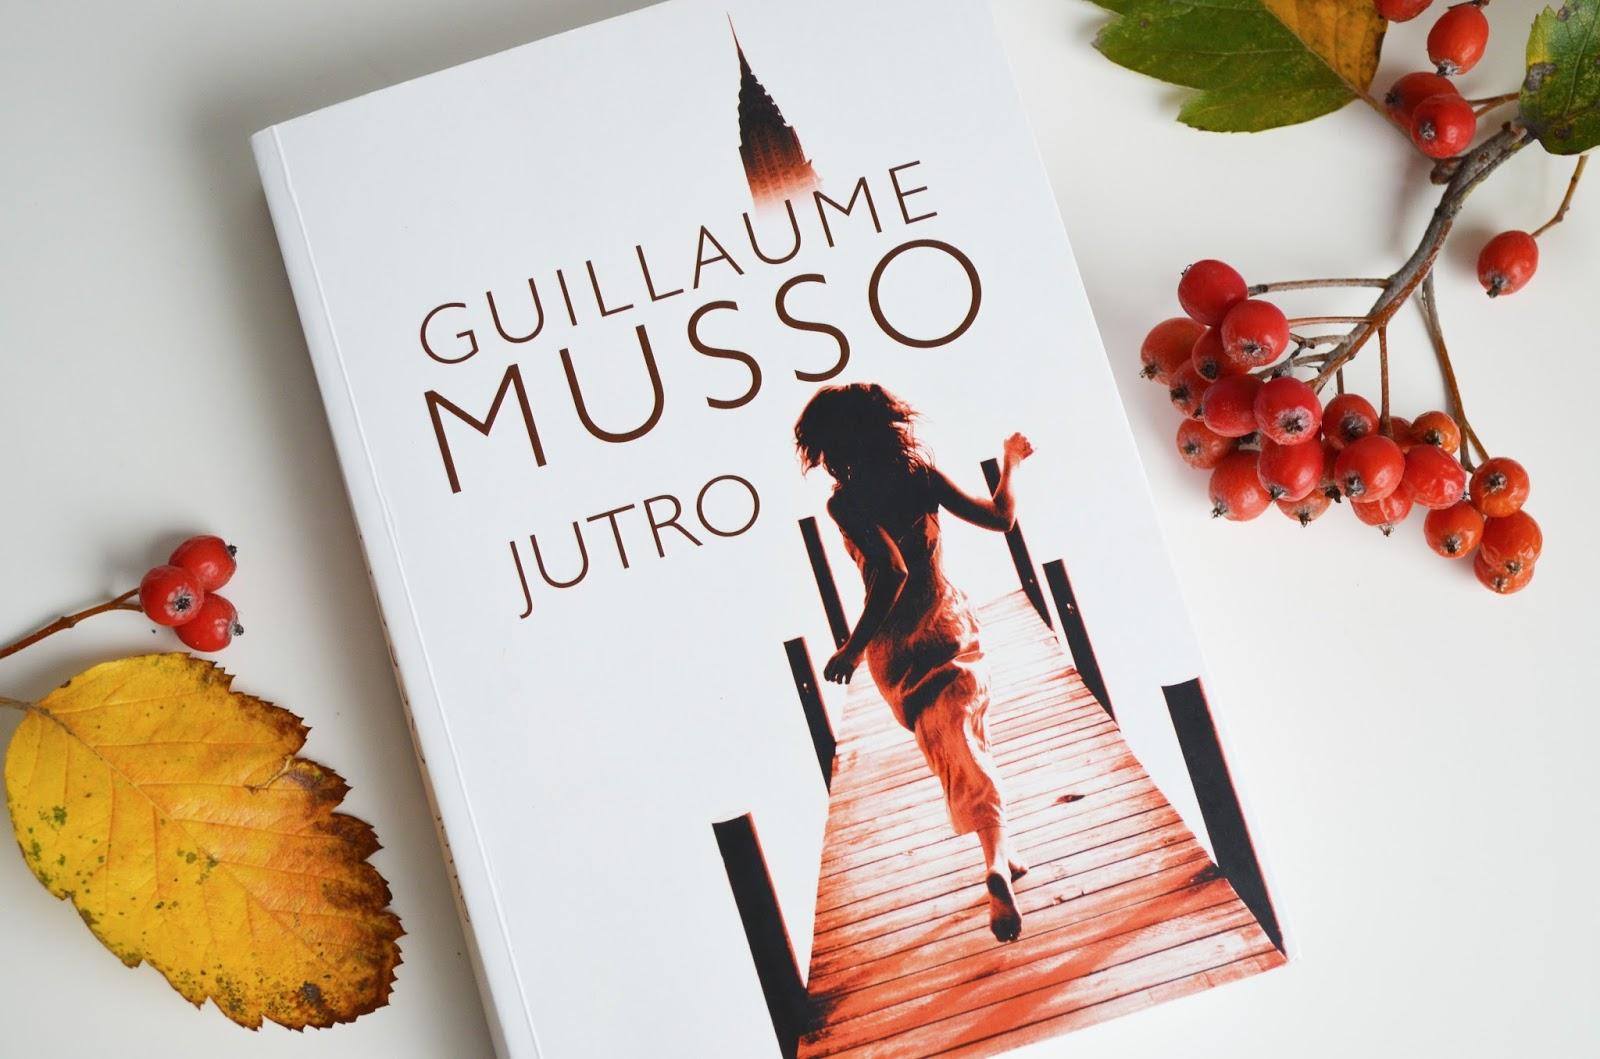 Guillauame Musso